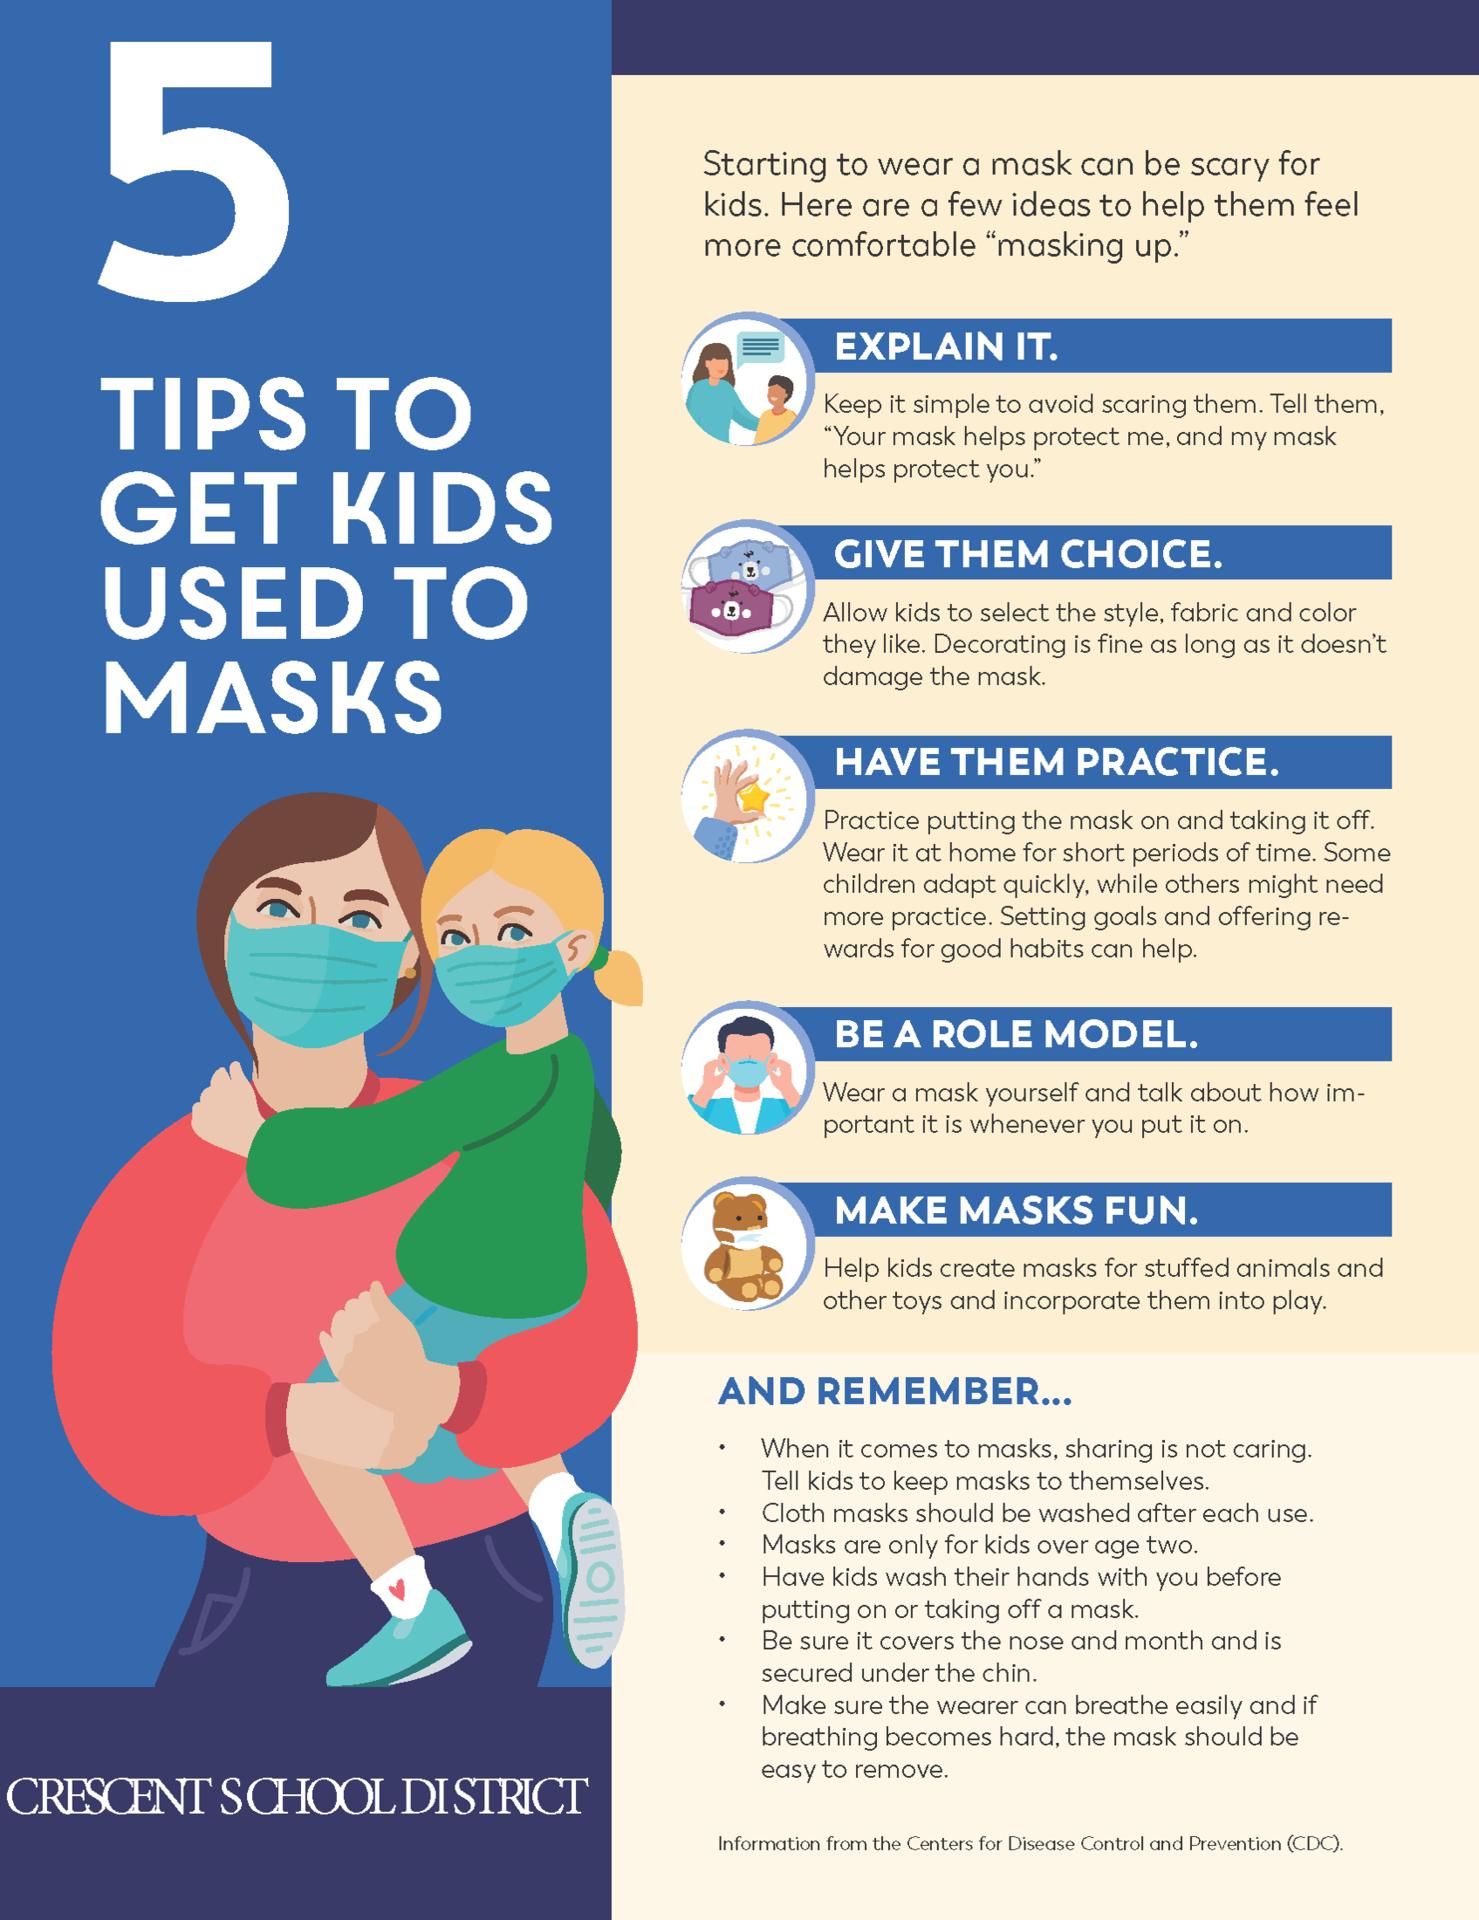 Mask tips